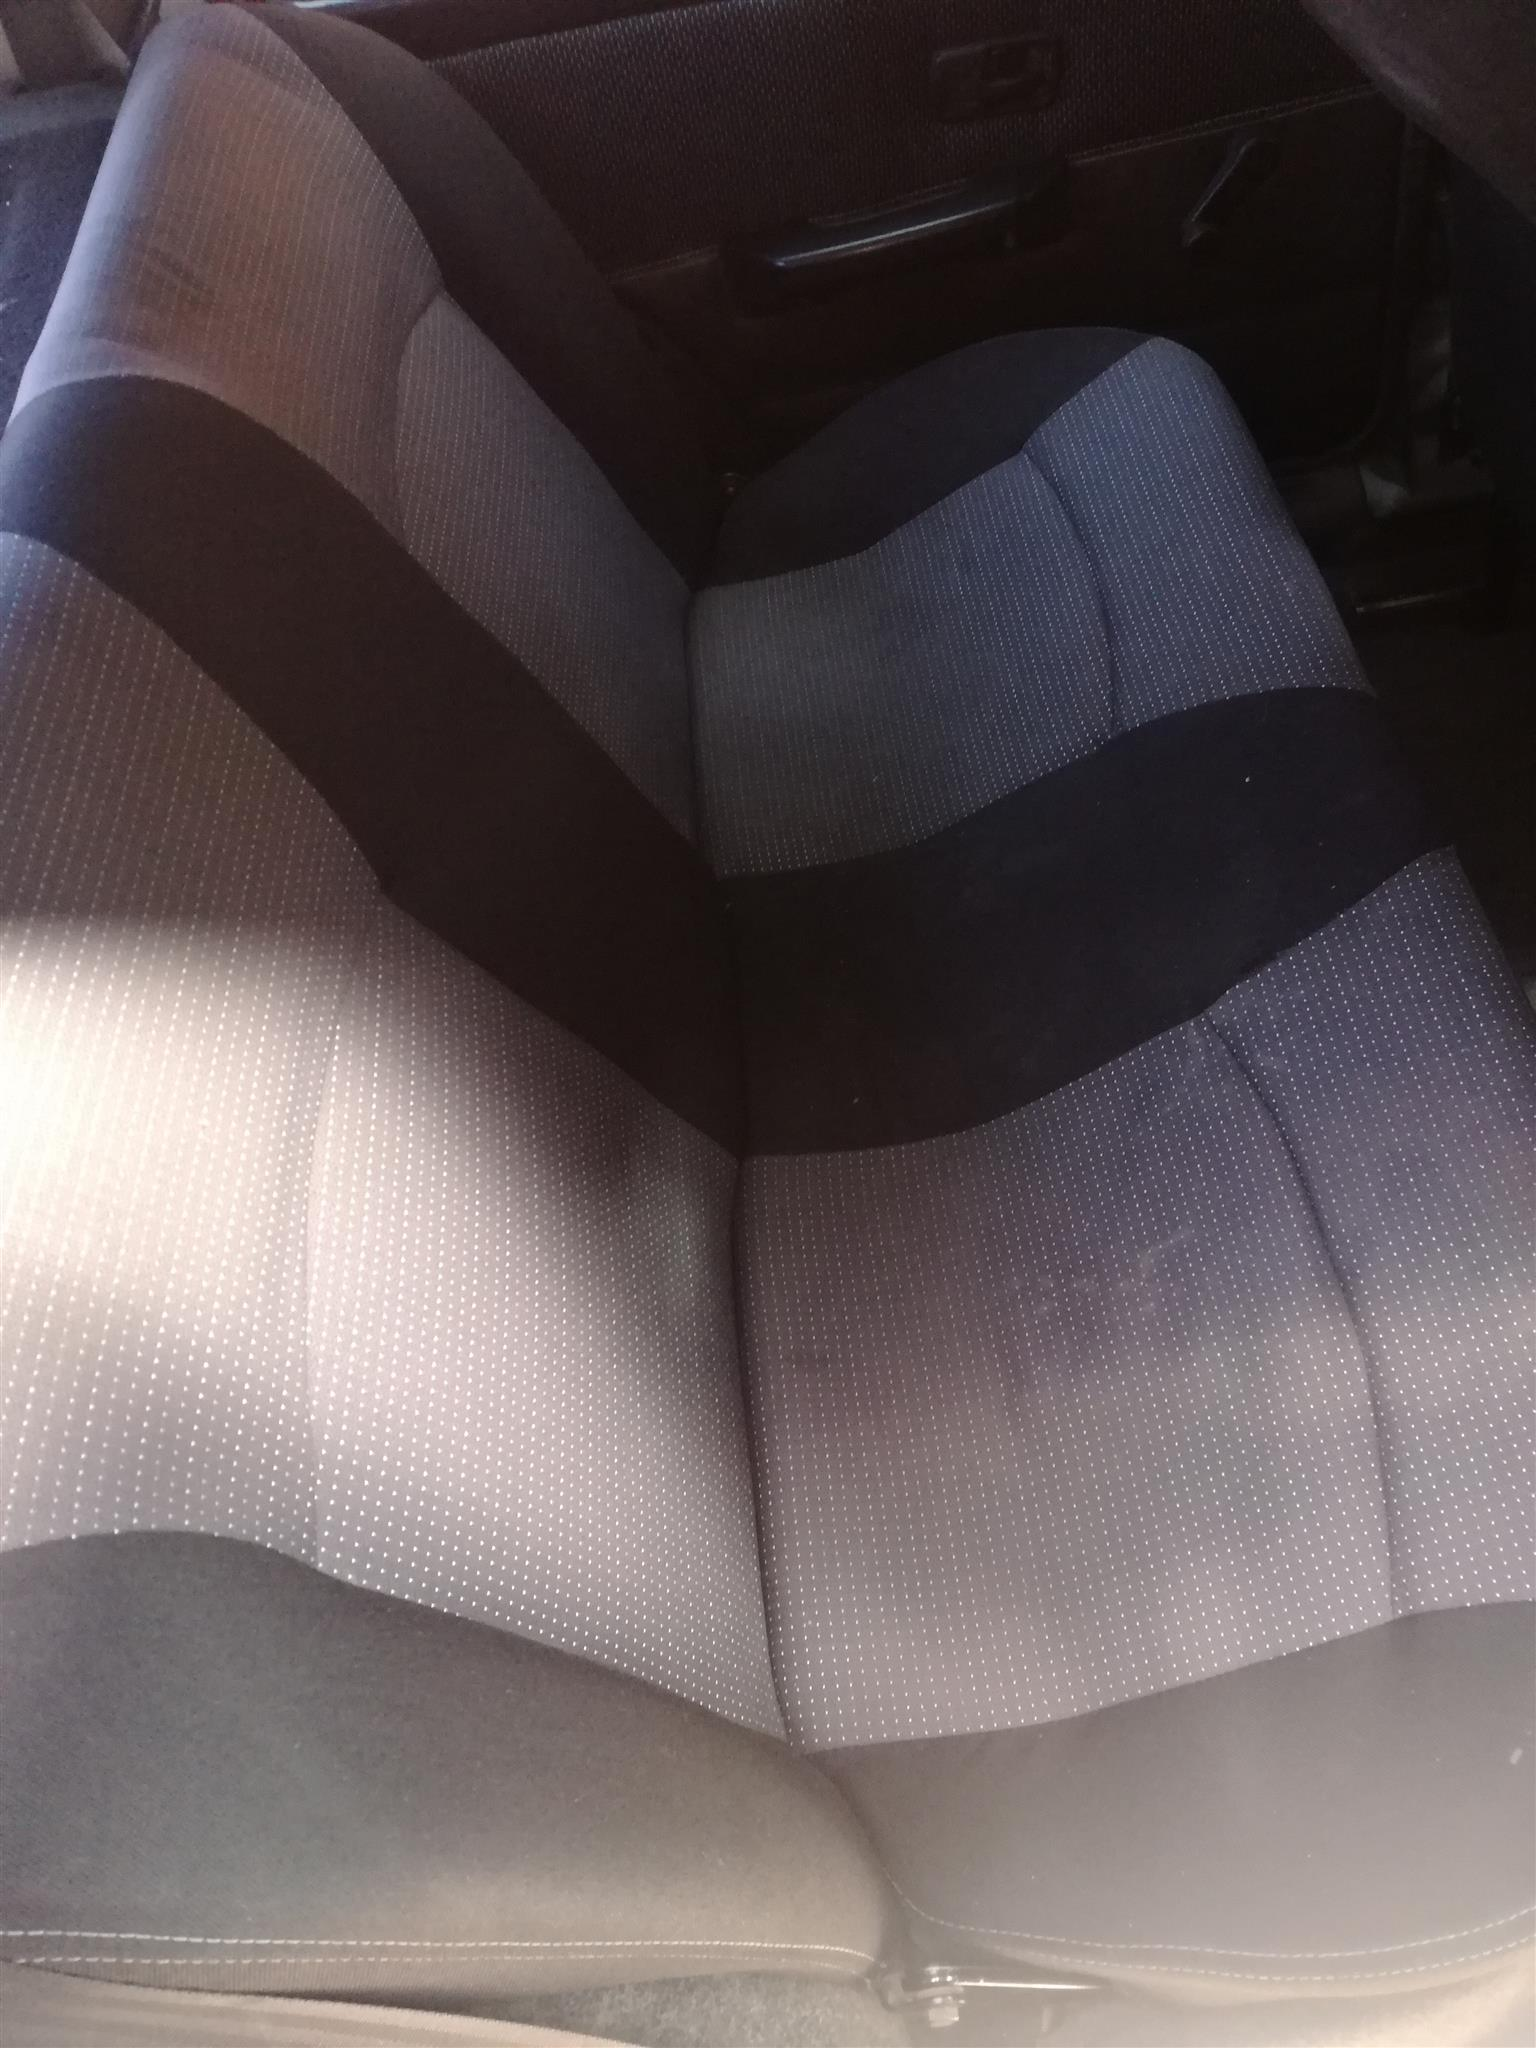 2003 VW Citi CITI 1.6i